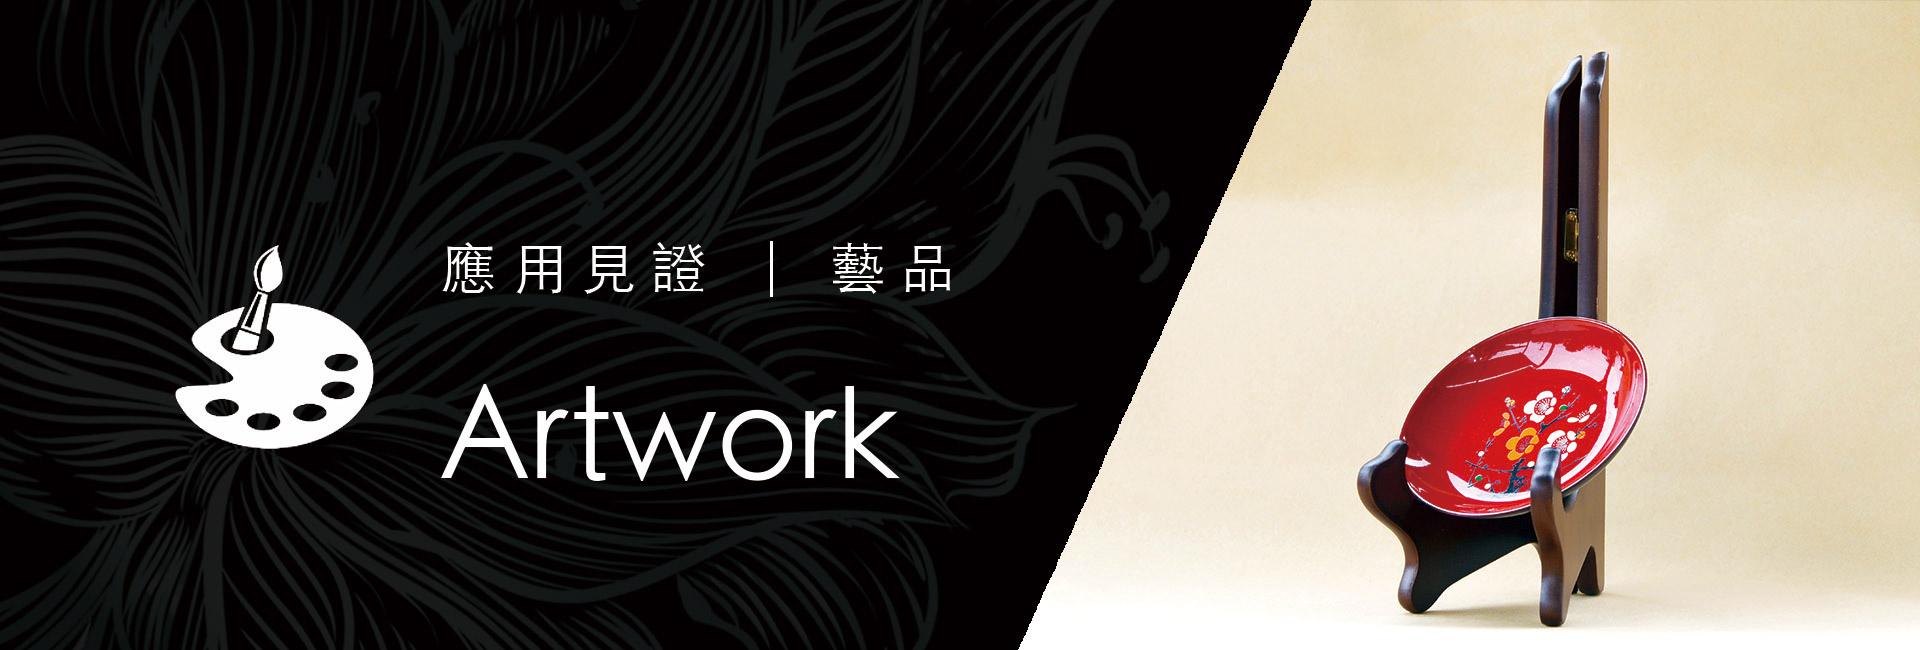 works-art